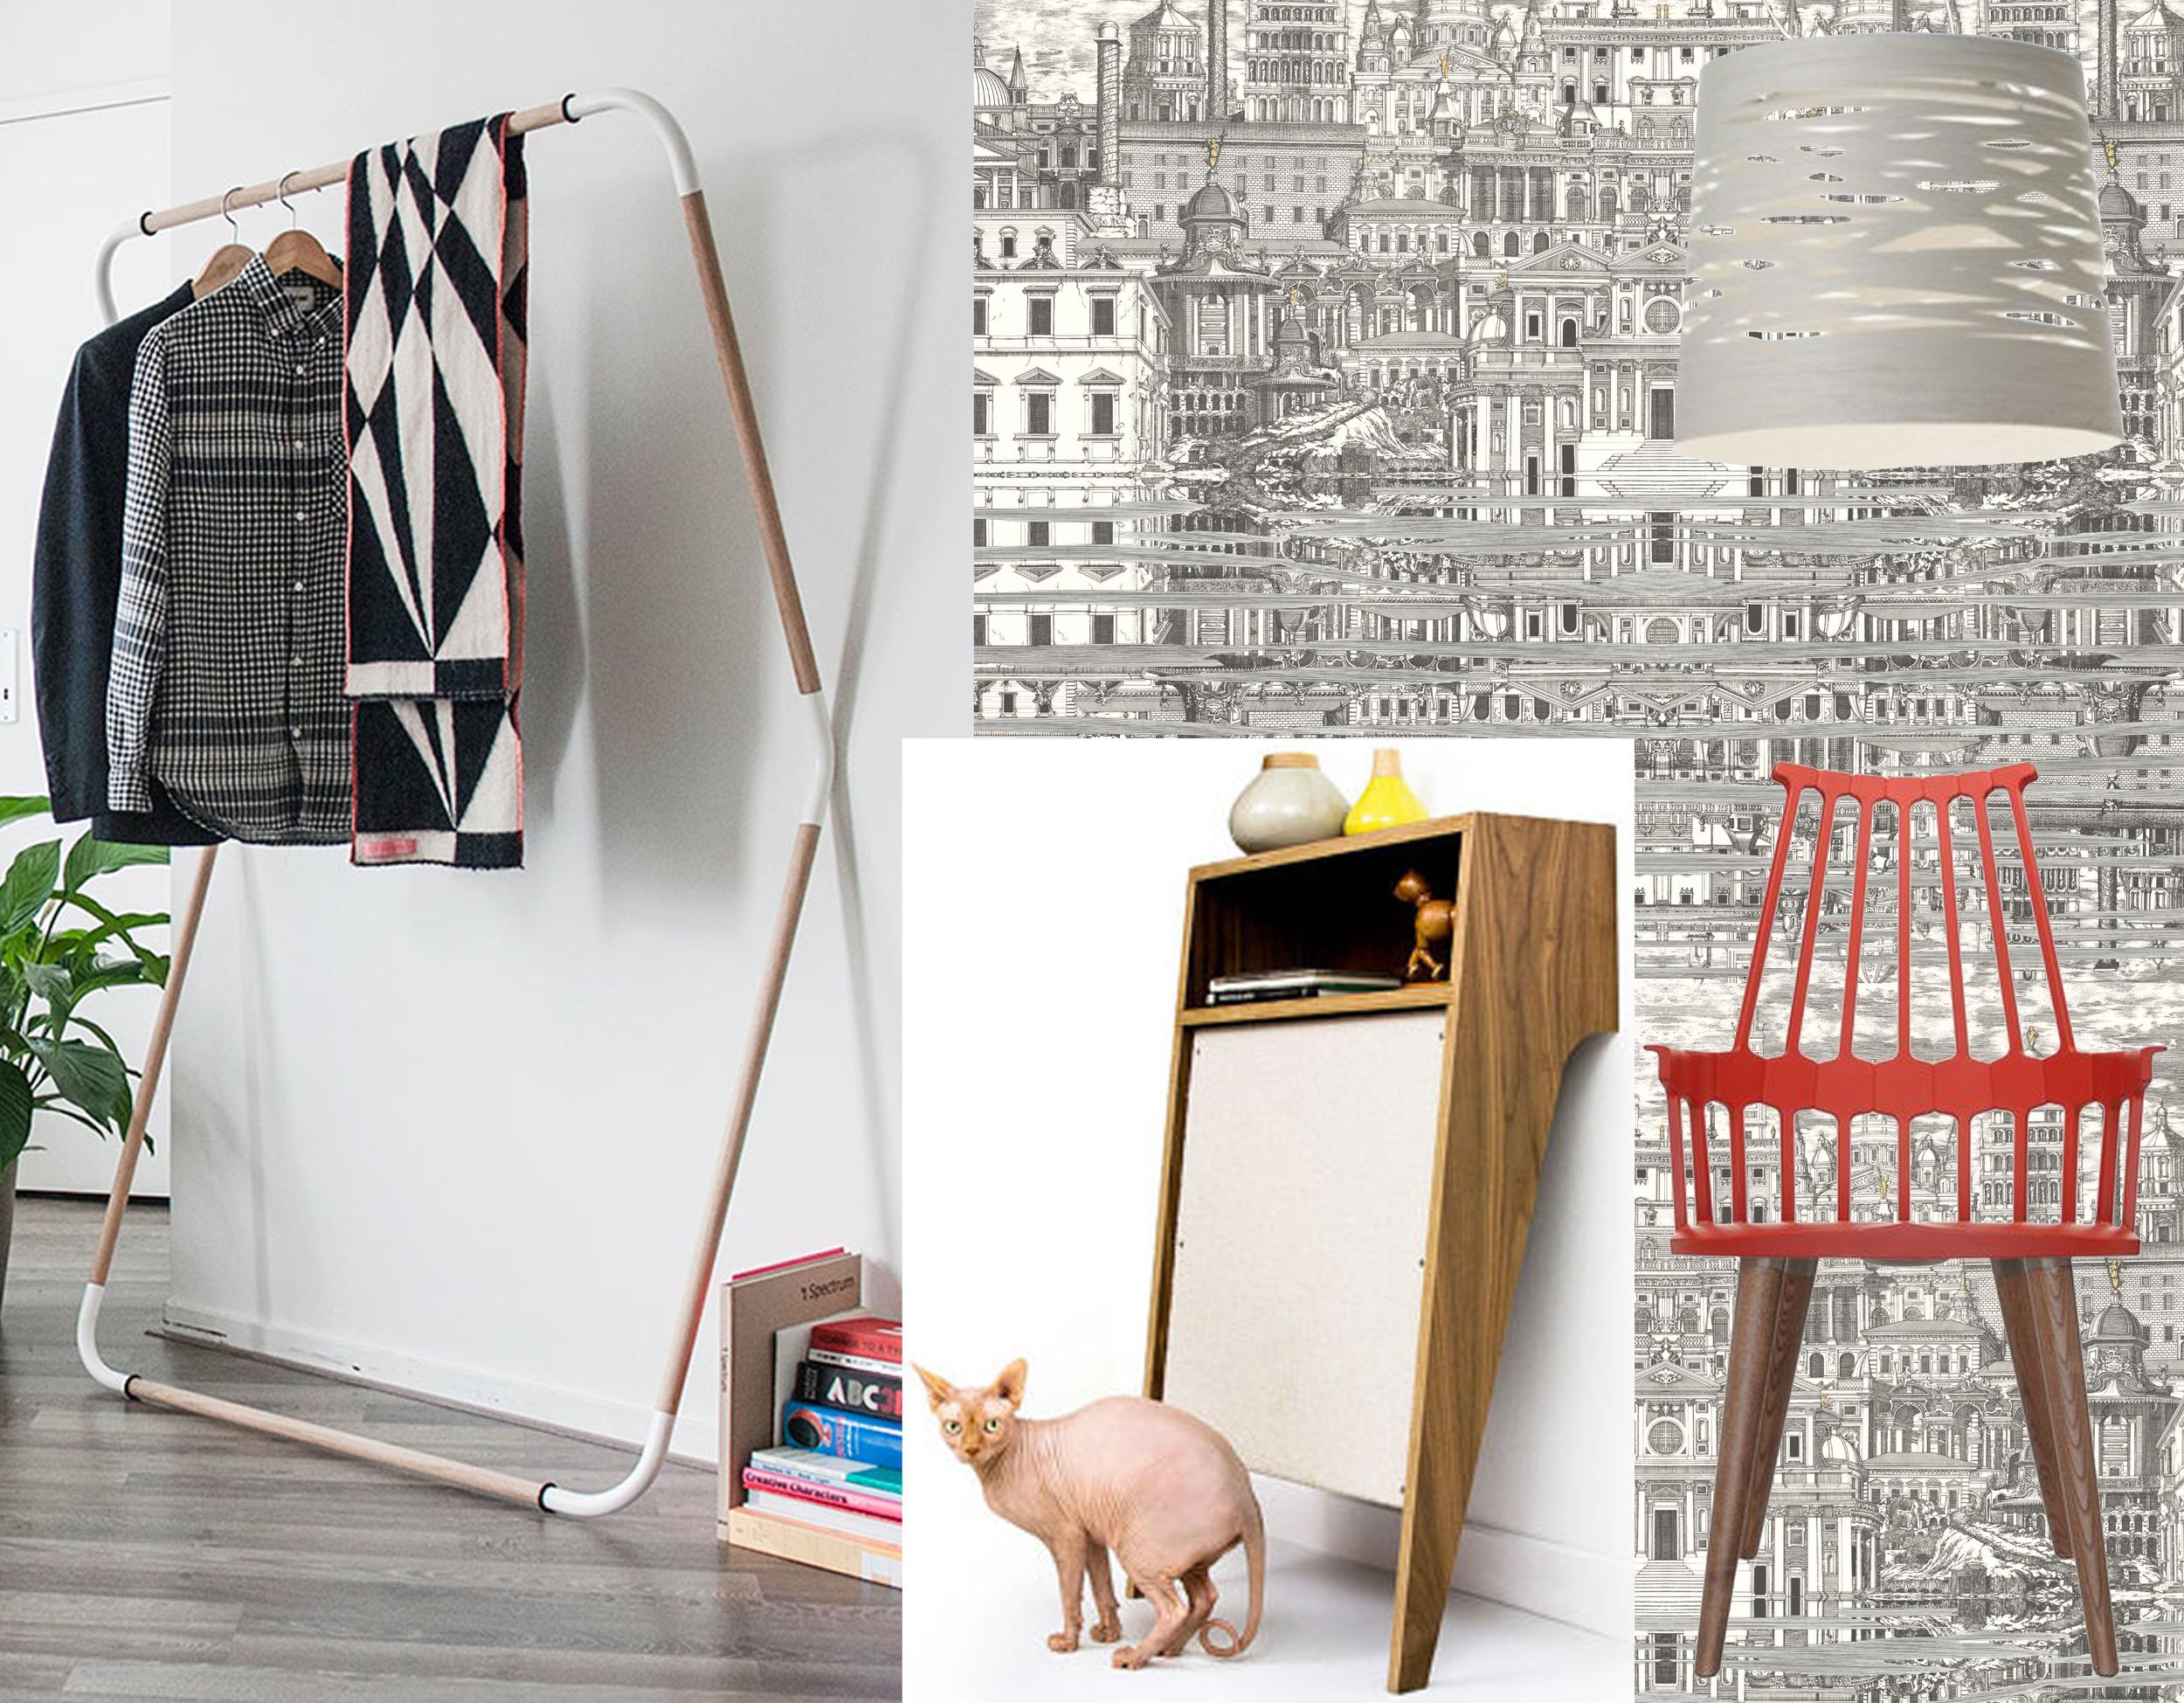 wallpaper Riflesso  Cole & Son  - chair Comback  Kartell  - hanging lamp Tress  Foscarini  - coatrack Jeroen Van Leur  Restored  - cat console  Modernist Cat